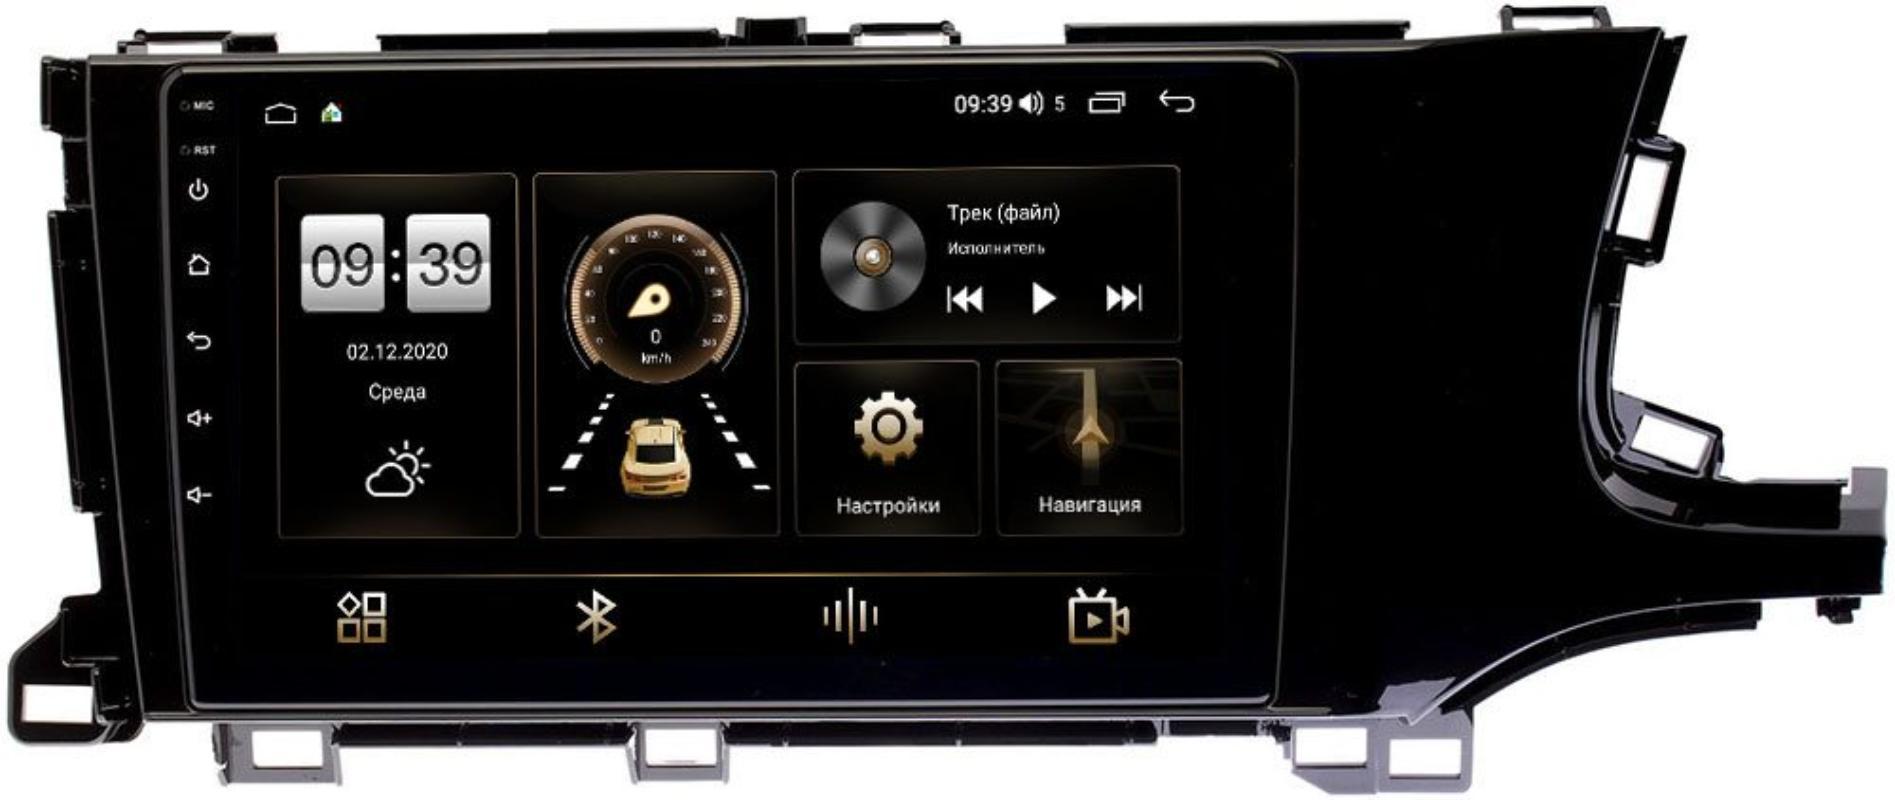 Штатная магнитола LeTrun 4166-9232 для Honda Shuttle II 2015-2021 на Android 10 (4G-SIM, 3/32, DSP, QLed) (+ Камера заднего вида в подарок!)